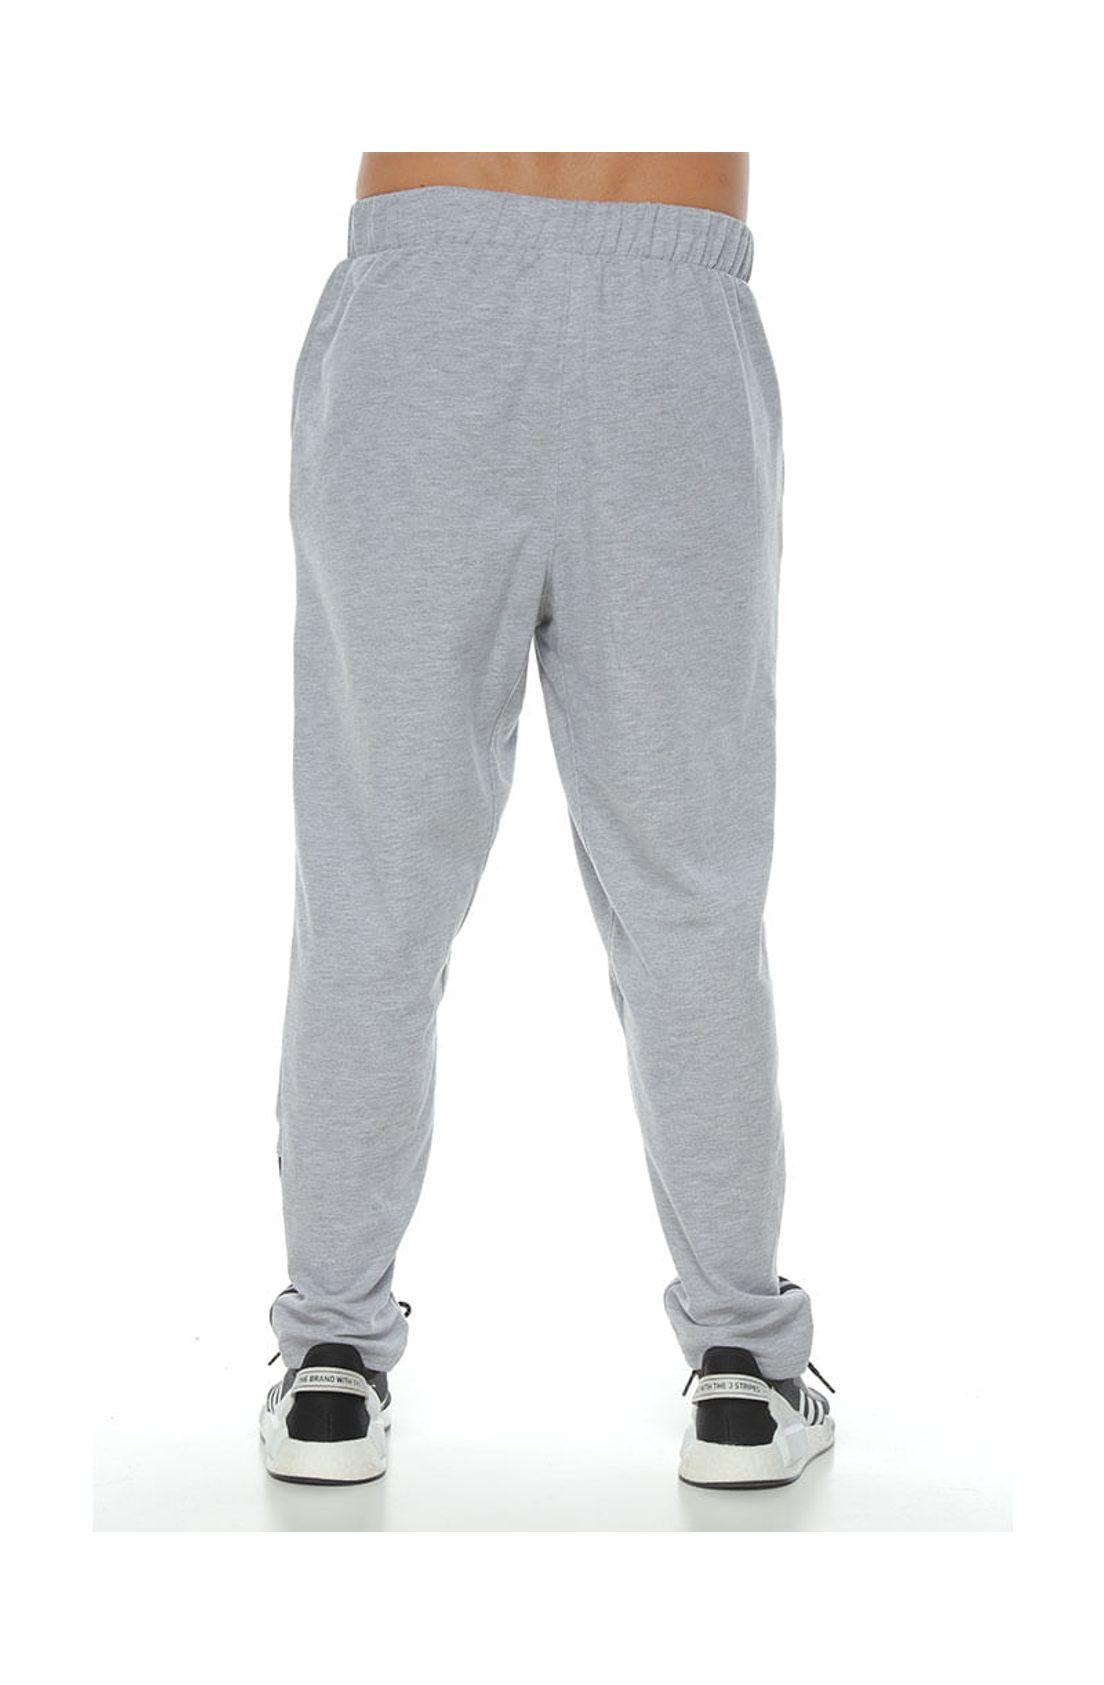 Pantalon Jogger Color Jasped Para Hombre Racketball Tennis